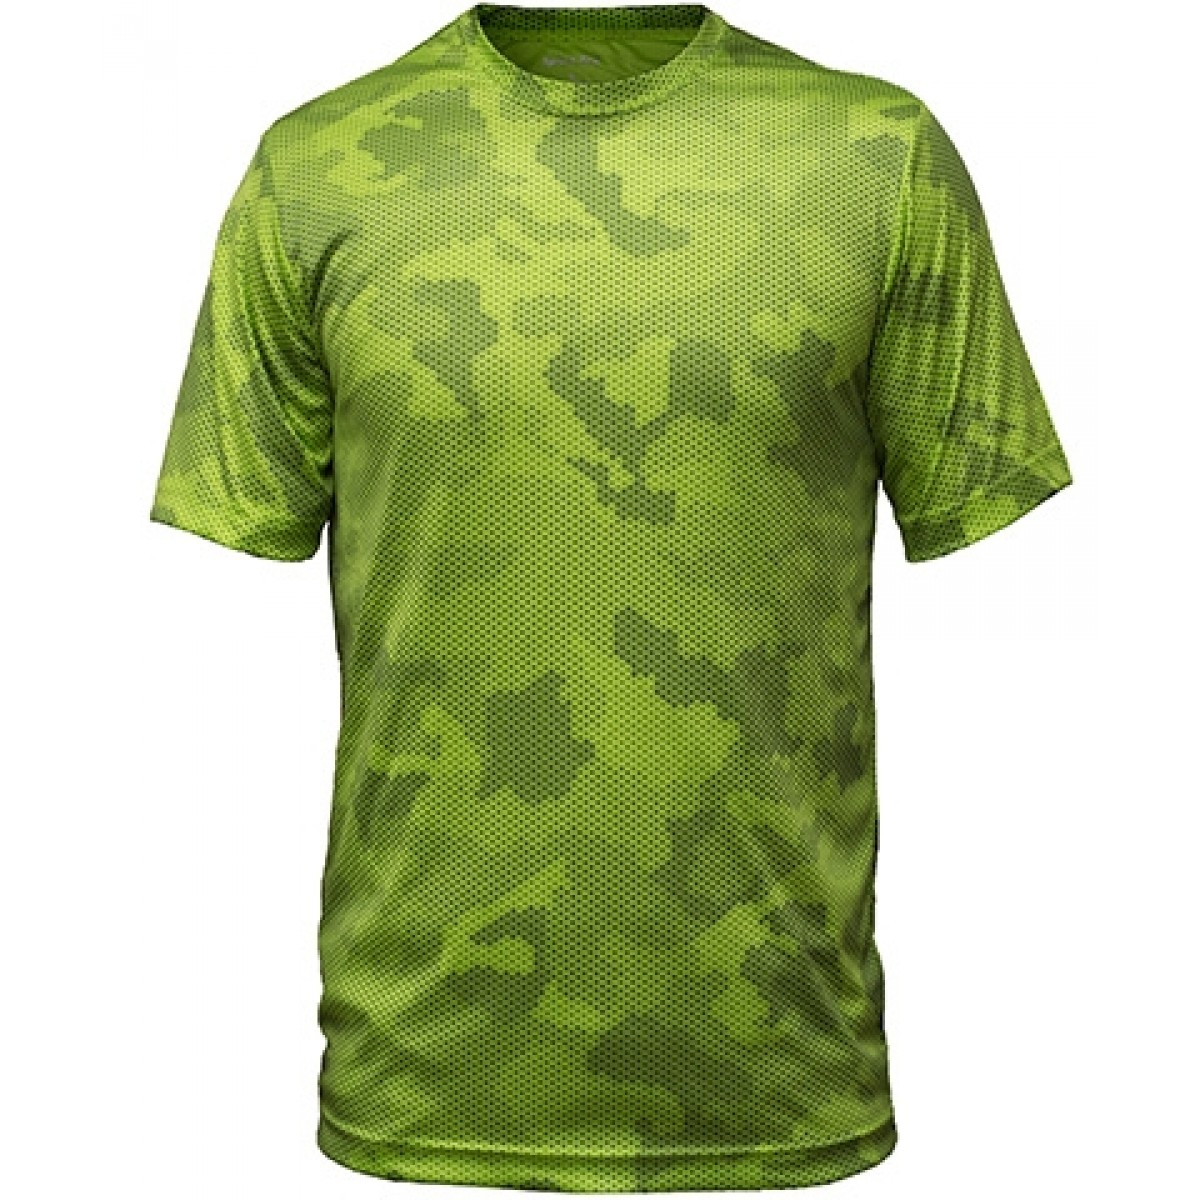 Green Camo Short Sleeve